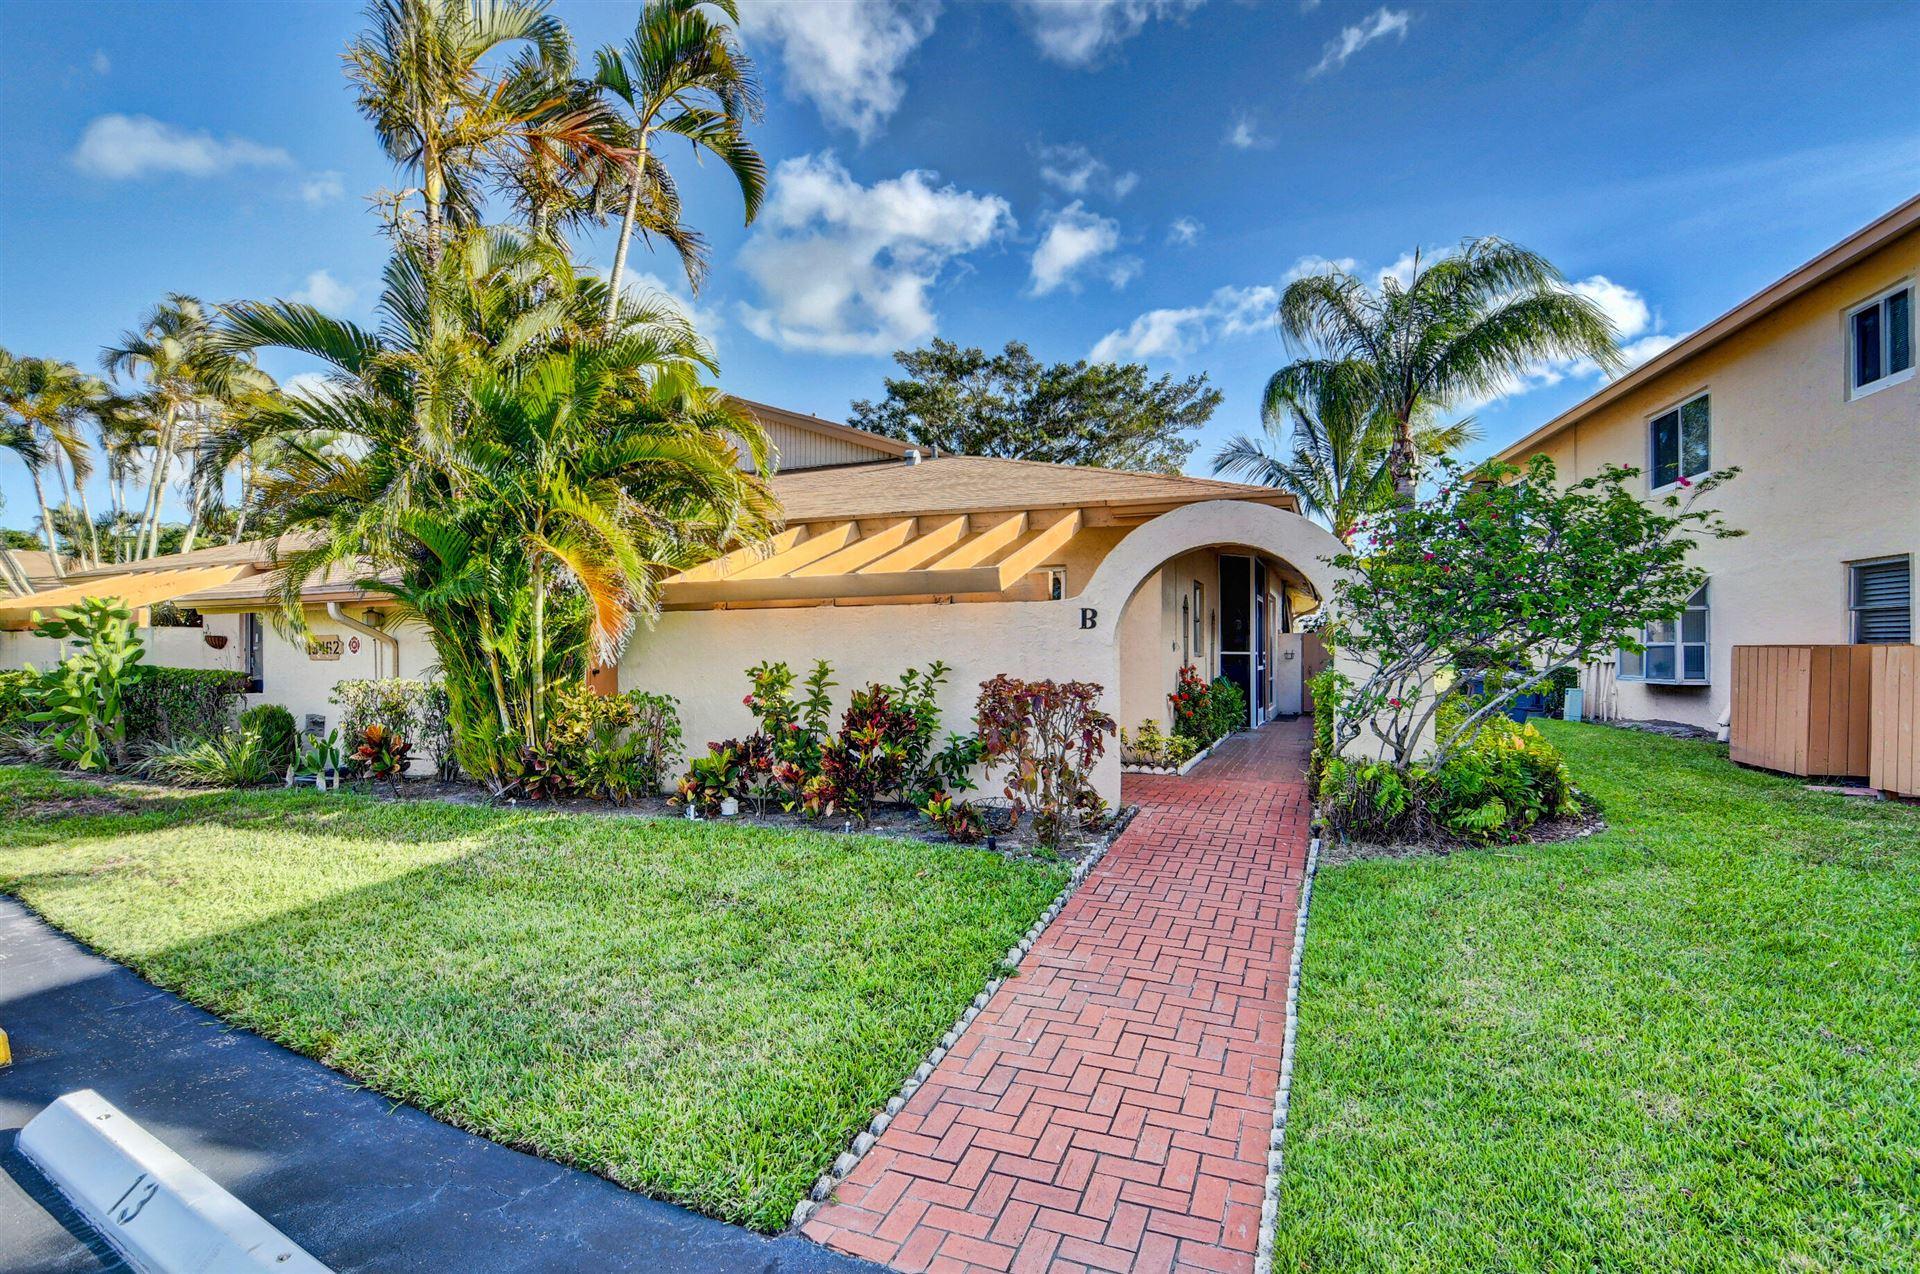 13462 Sabal Palm Court #B, Delray Beach, FL 33484 - MLS#: RX-10723085